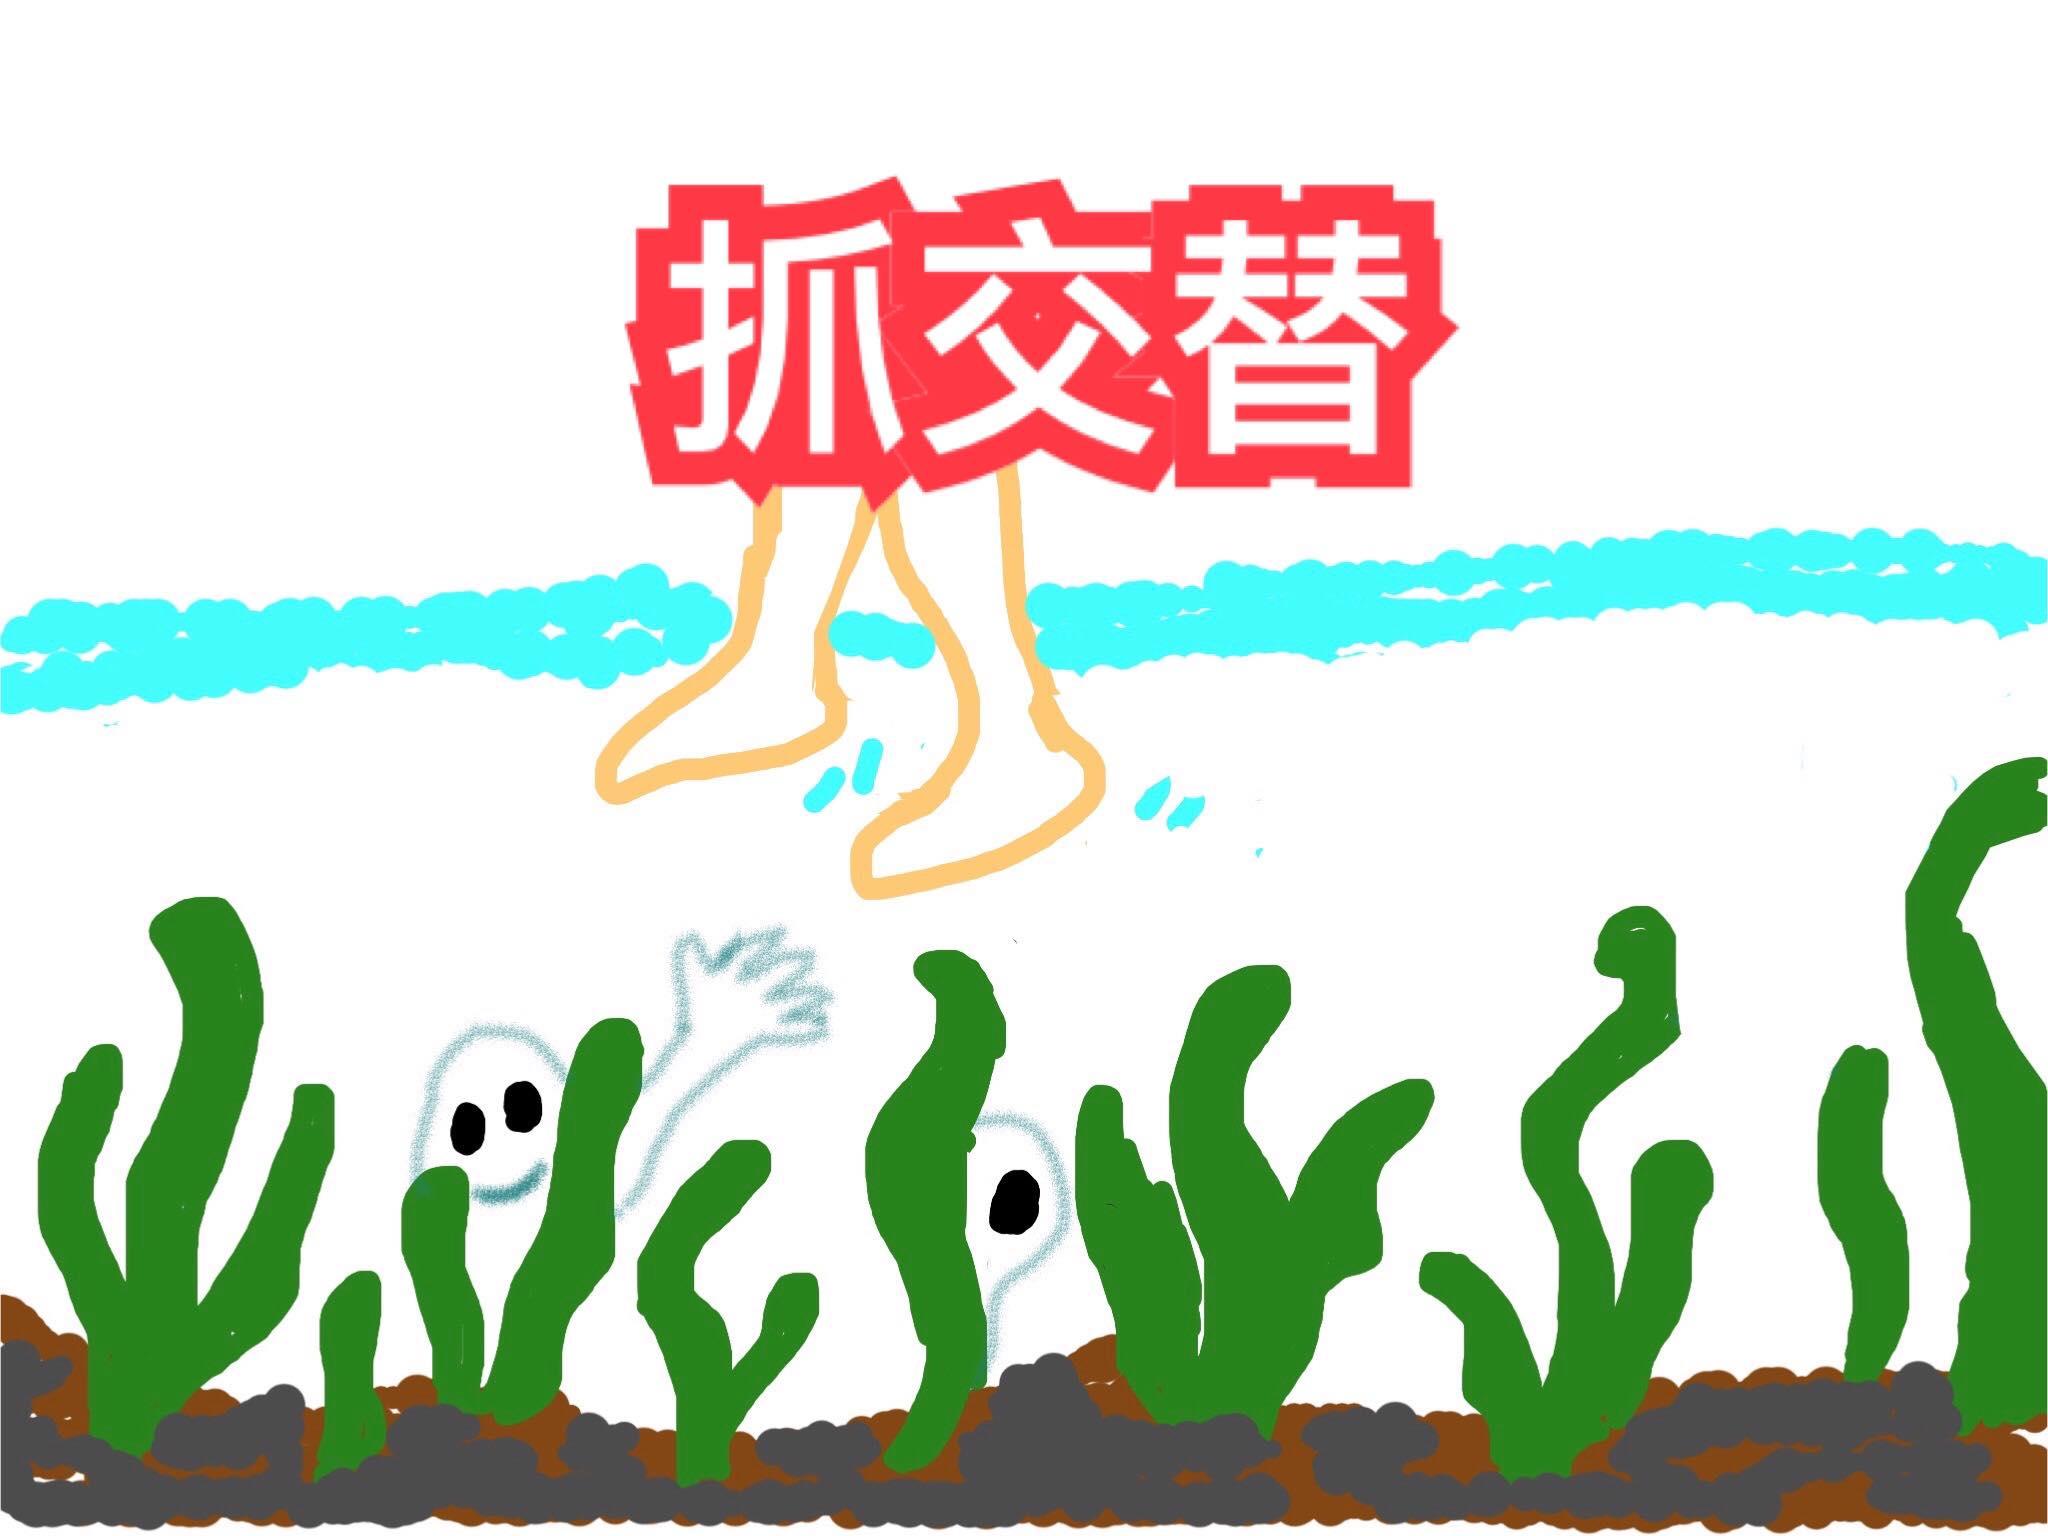 B6地下六層 / 民間傳說~ 抓交替!?